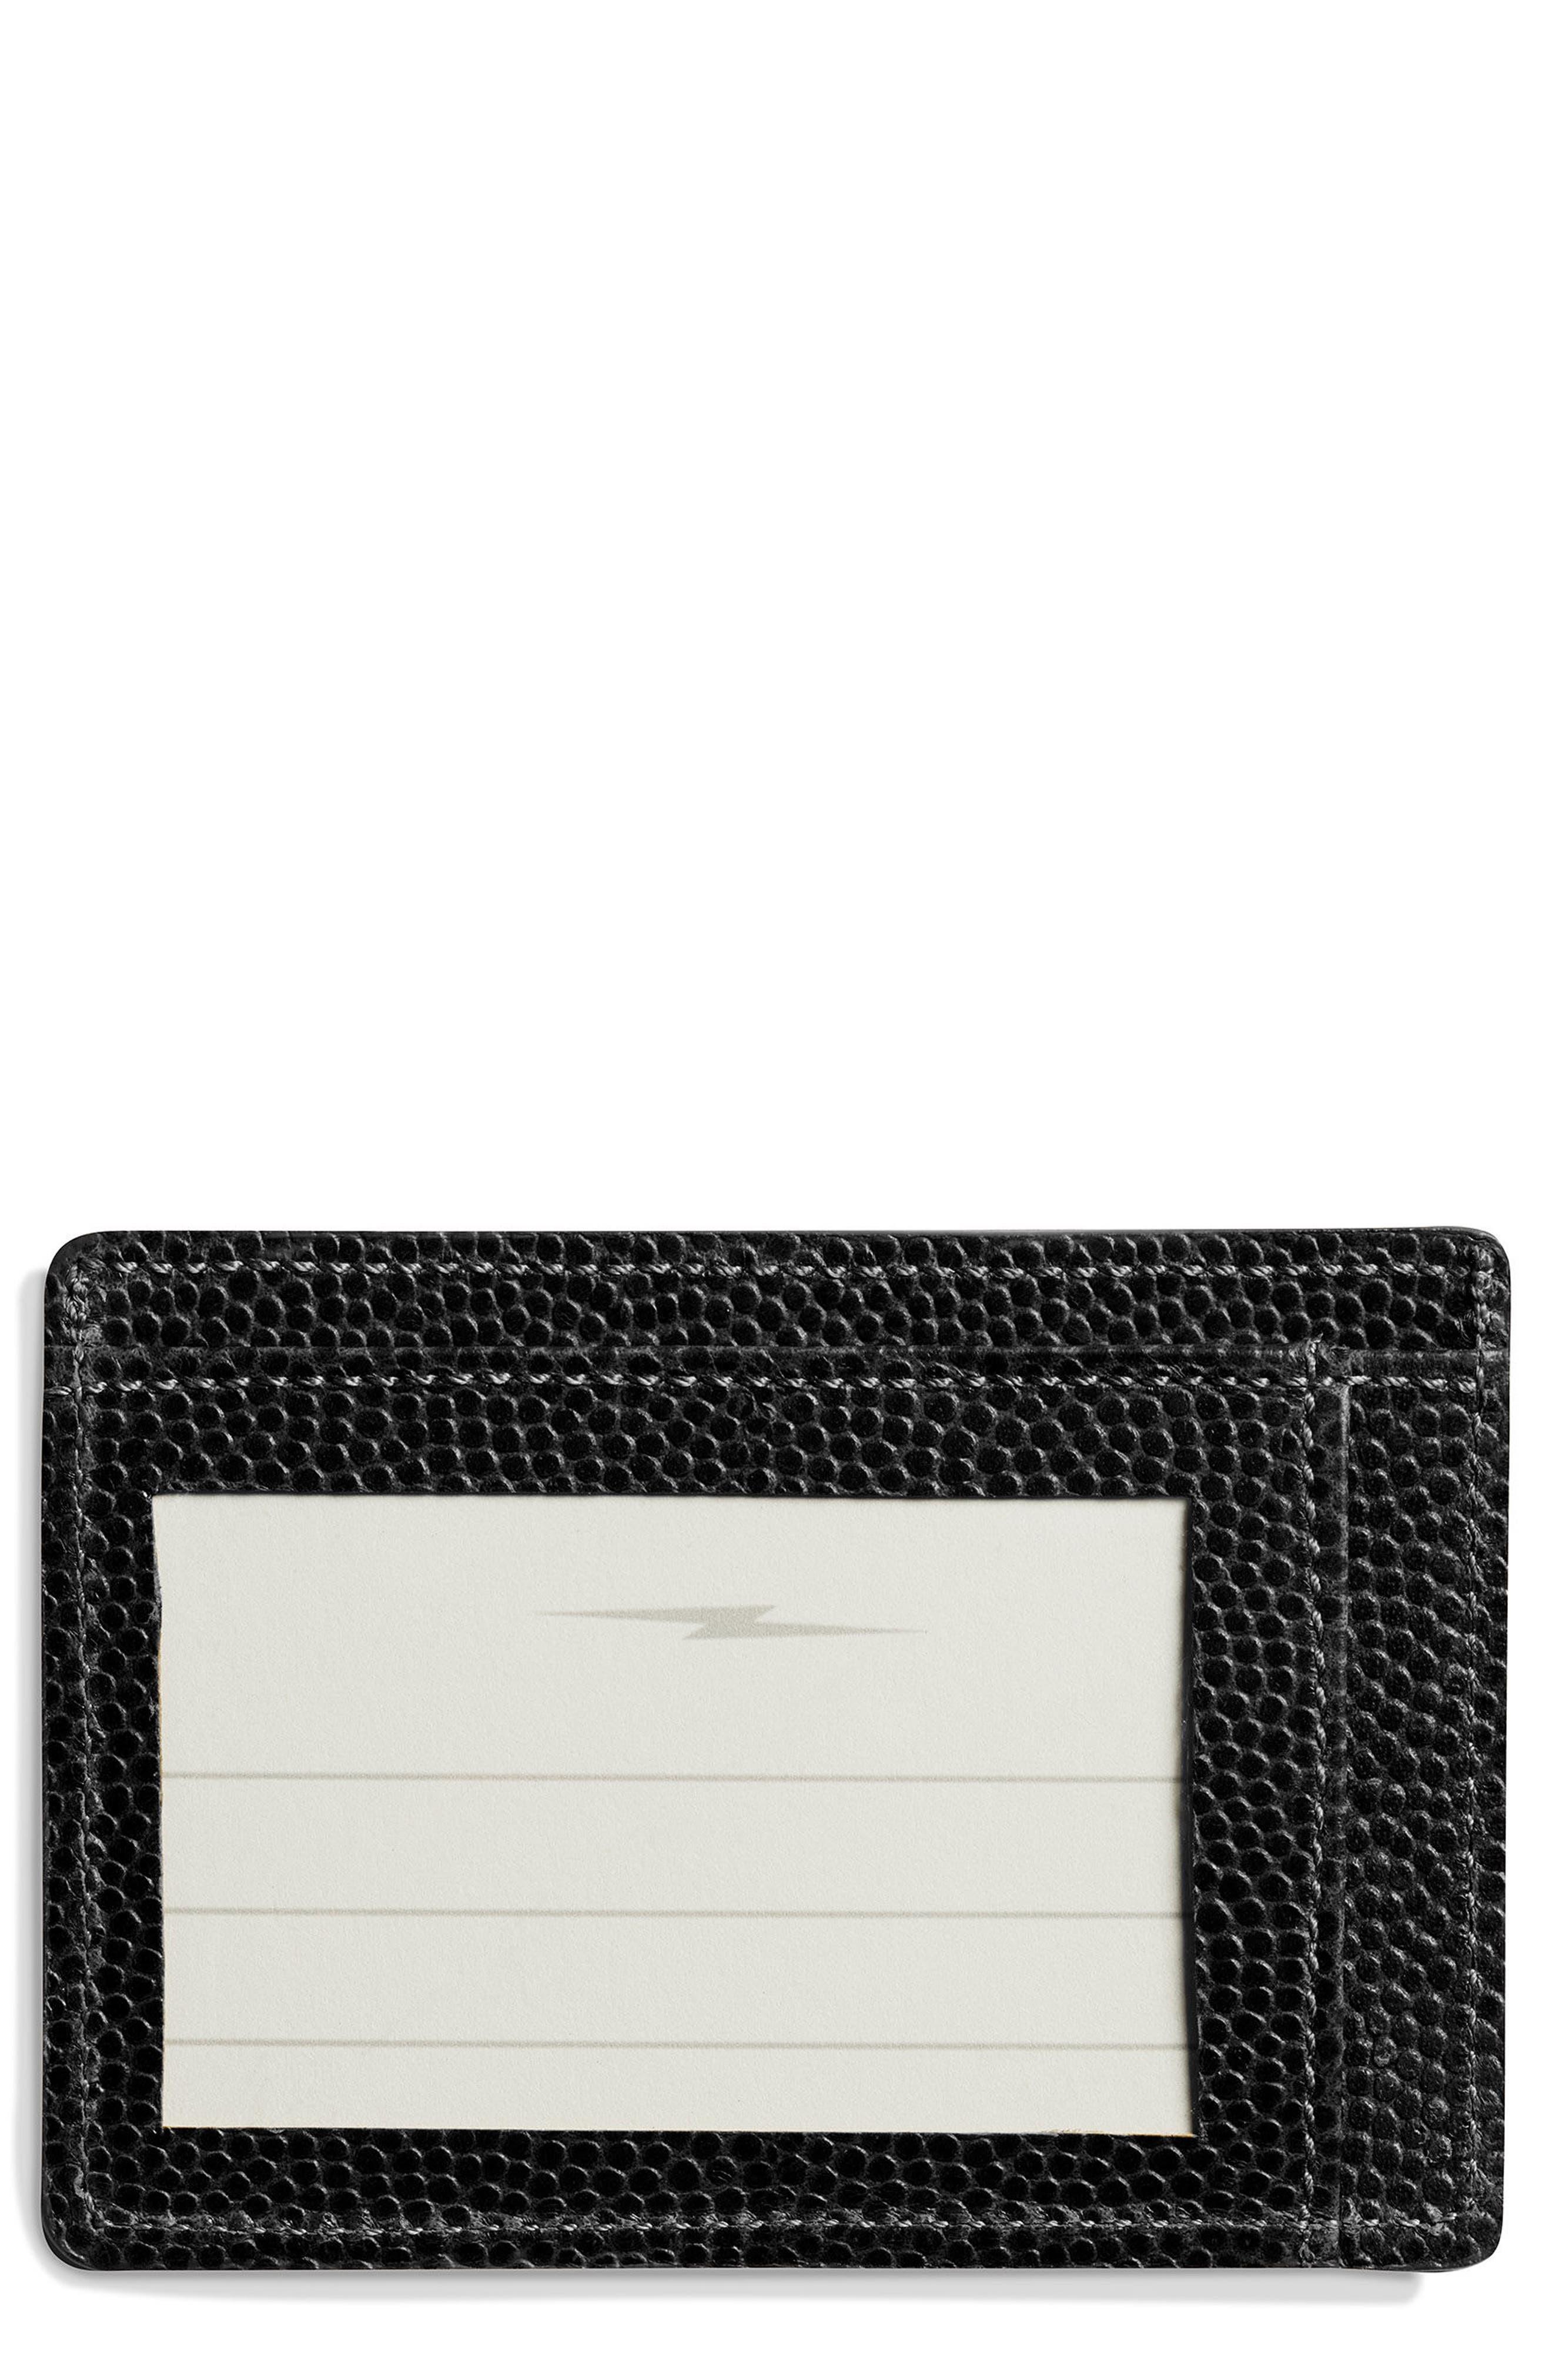 Alternate Image 1 Selected - Shinola Latigo Leather Card Case